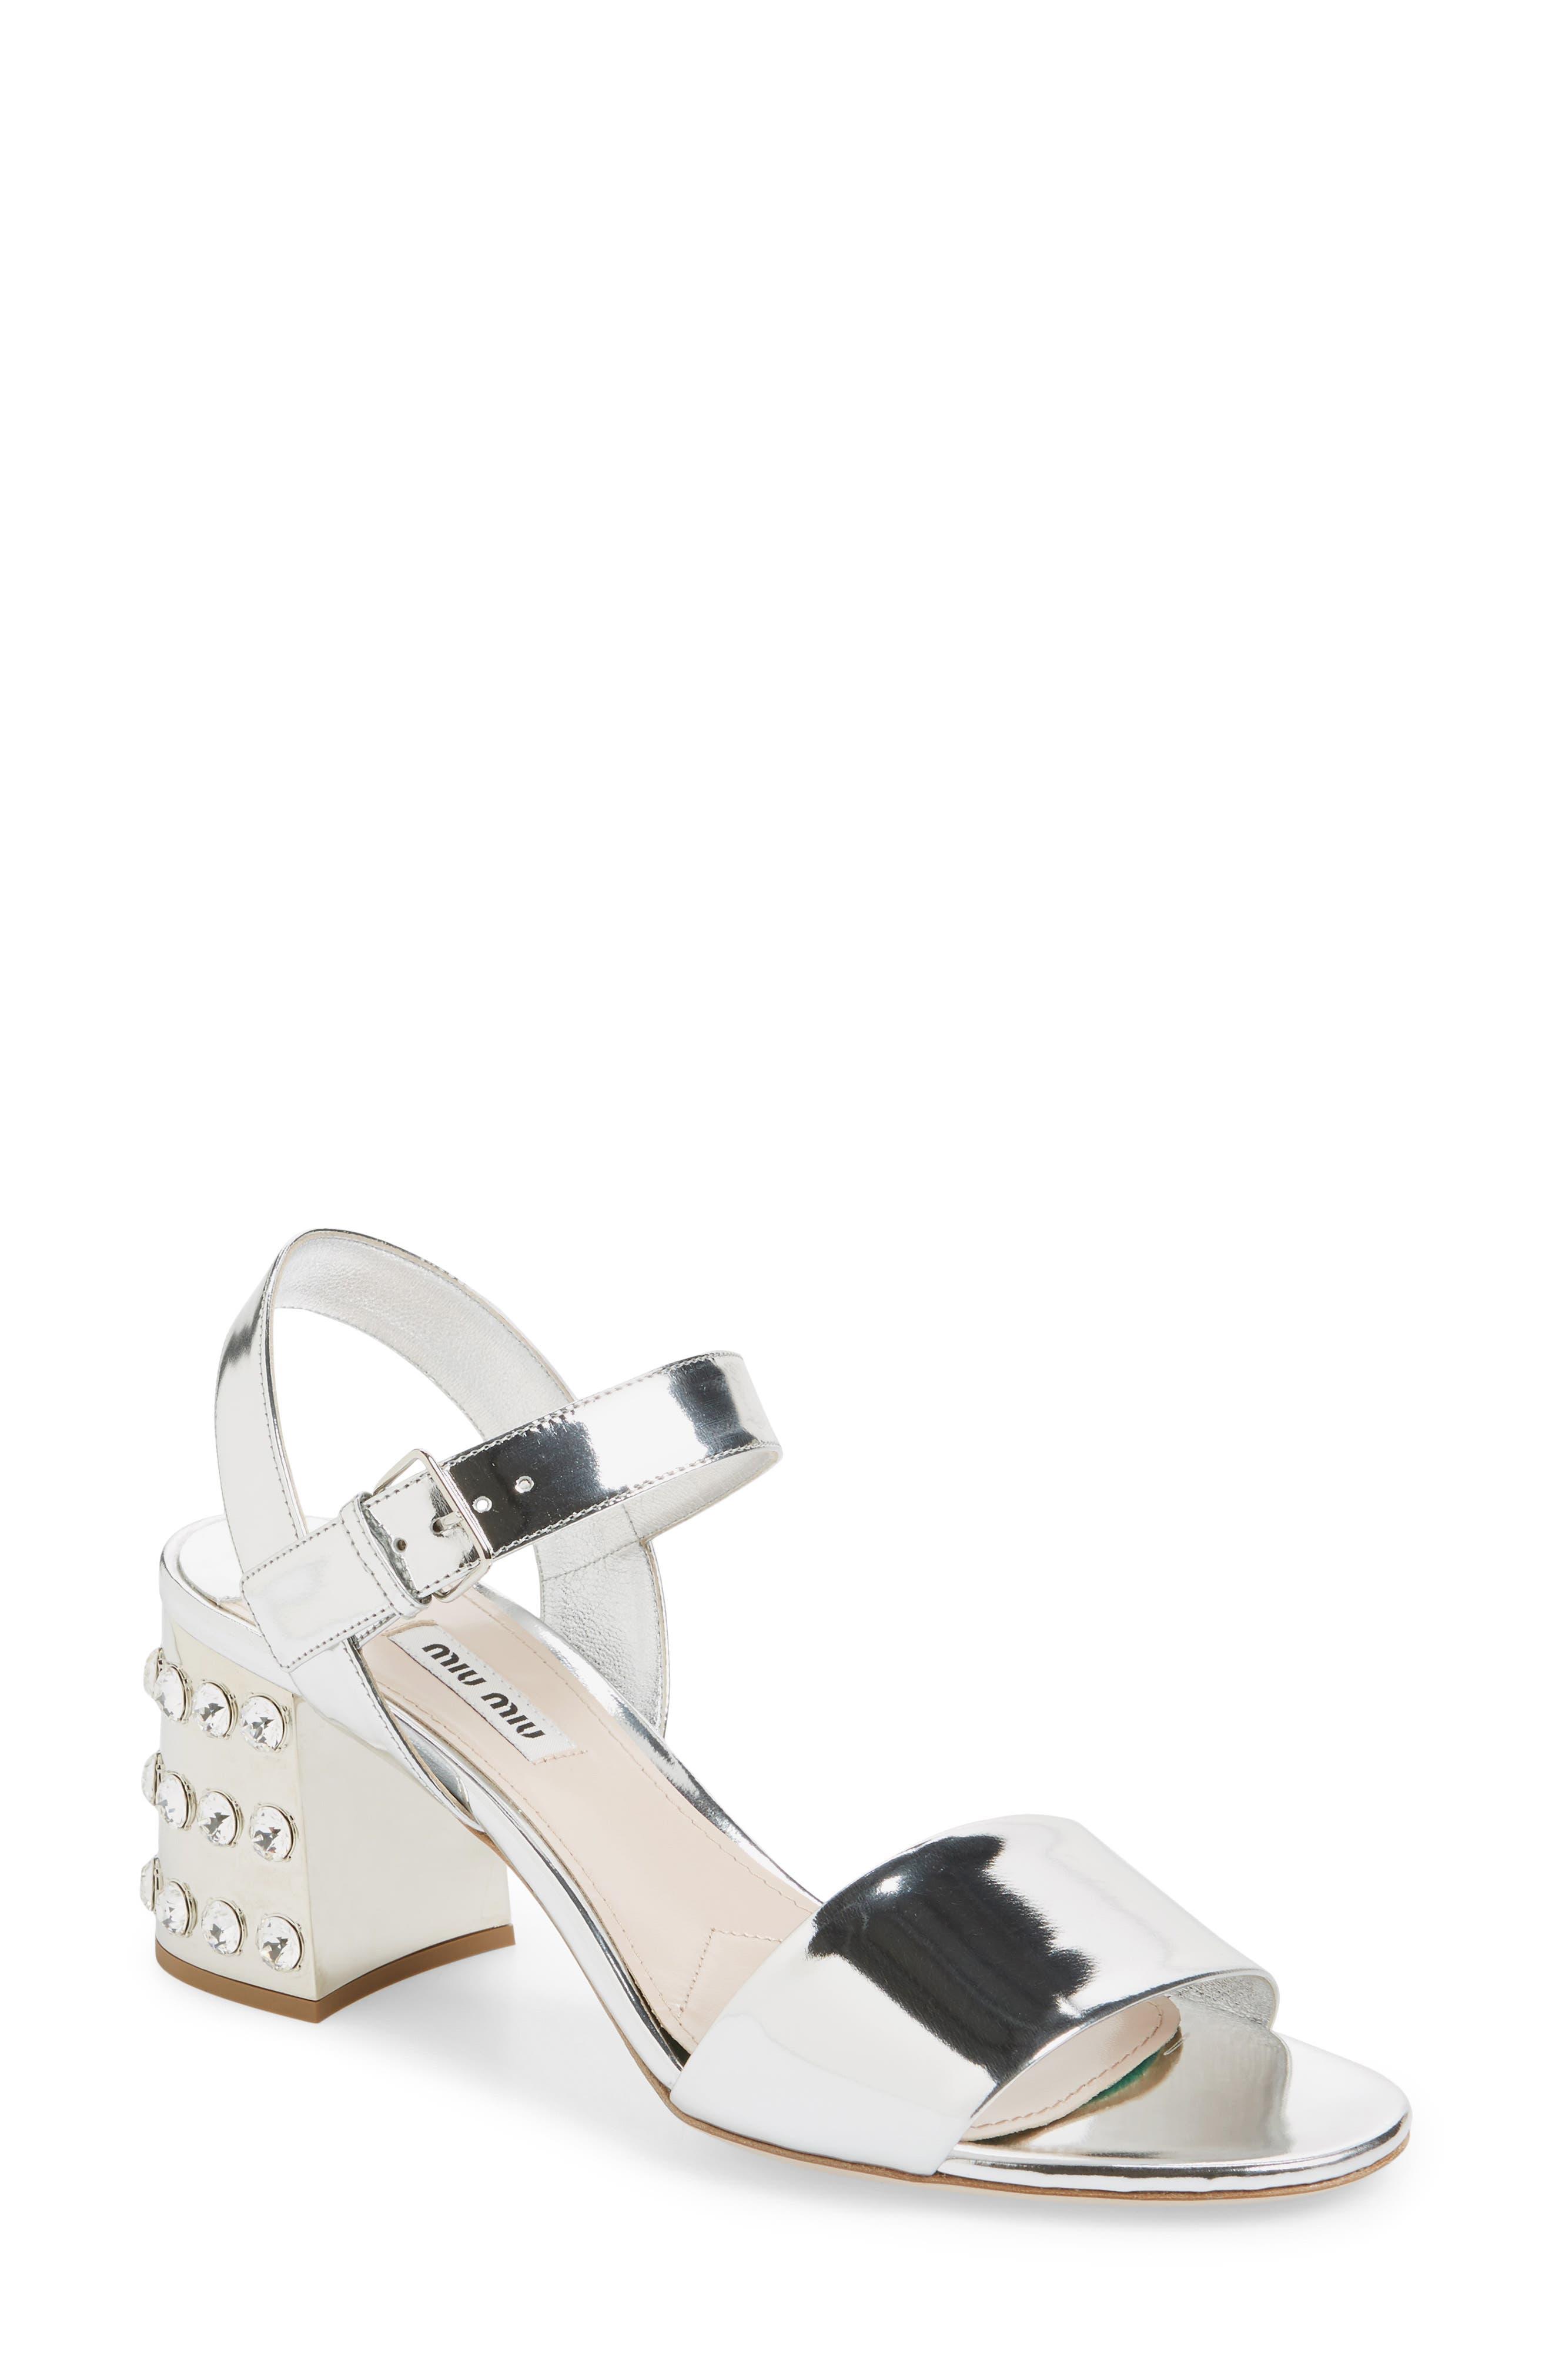 Alternate Image 1 Selected - Miu Miu Crystal Embellished Block Heel Sandal (Women)